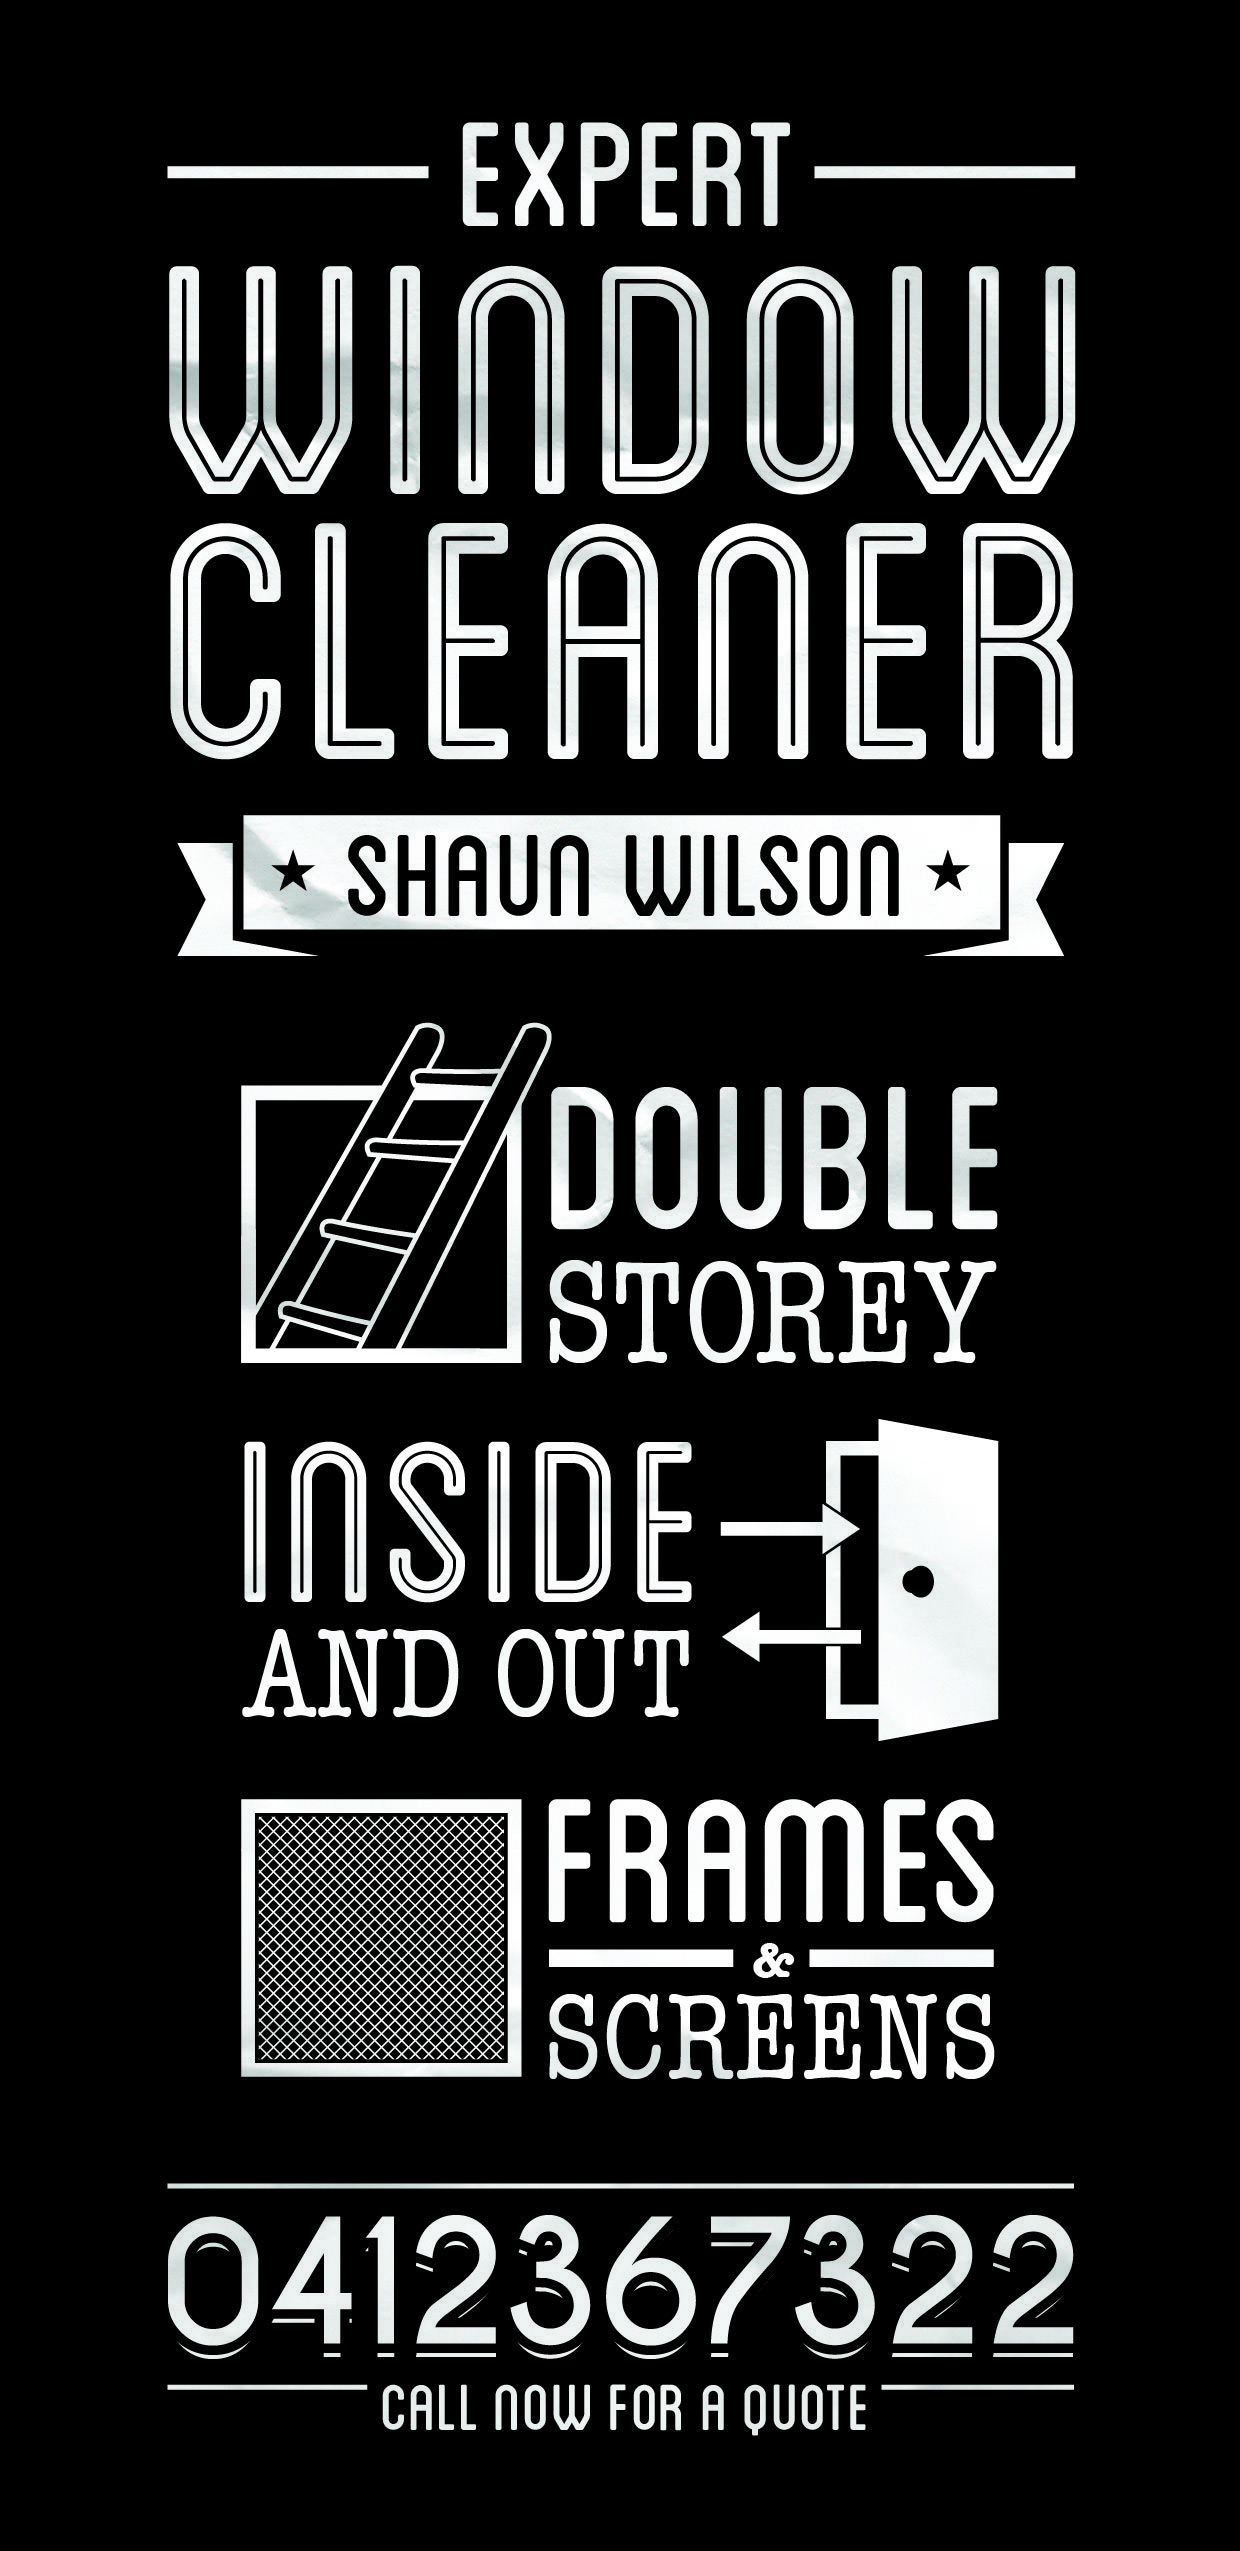 Window cleaning flyer design.   Graphic Design   Pinterest